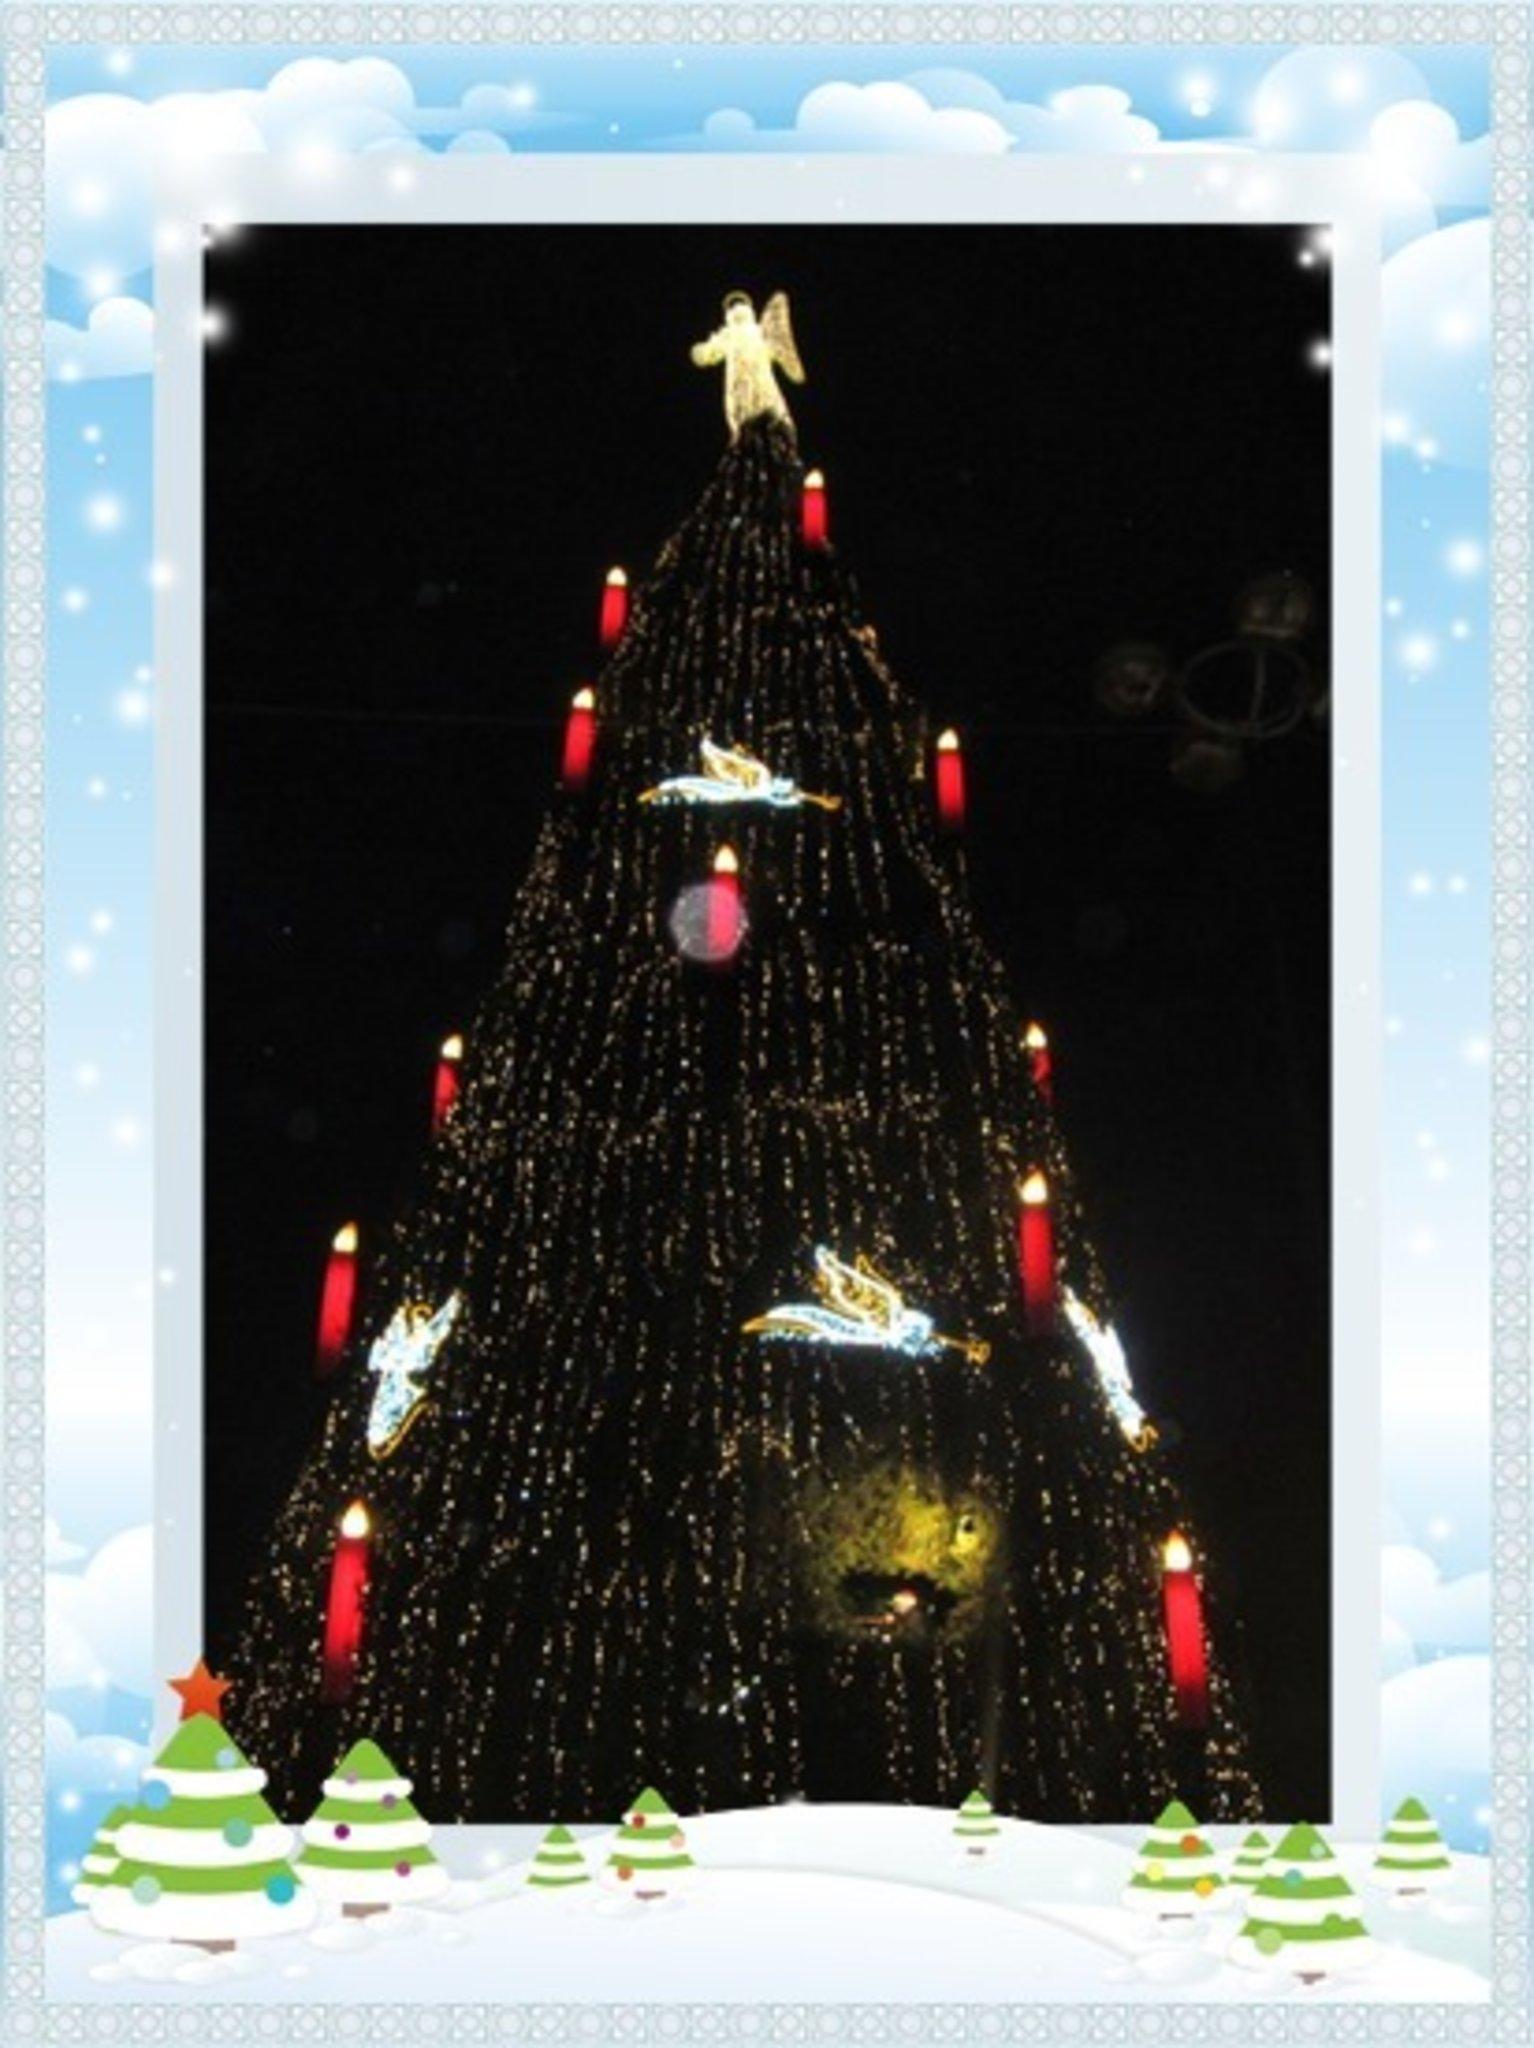 Wünsche Euch Besinnliche Weihnachten.Wünsche Euch Allen Eine Besinnliche Weihnacht Unna